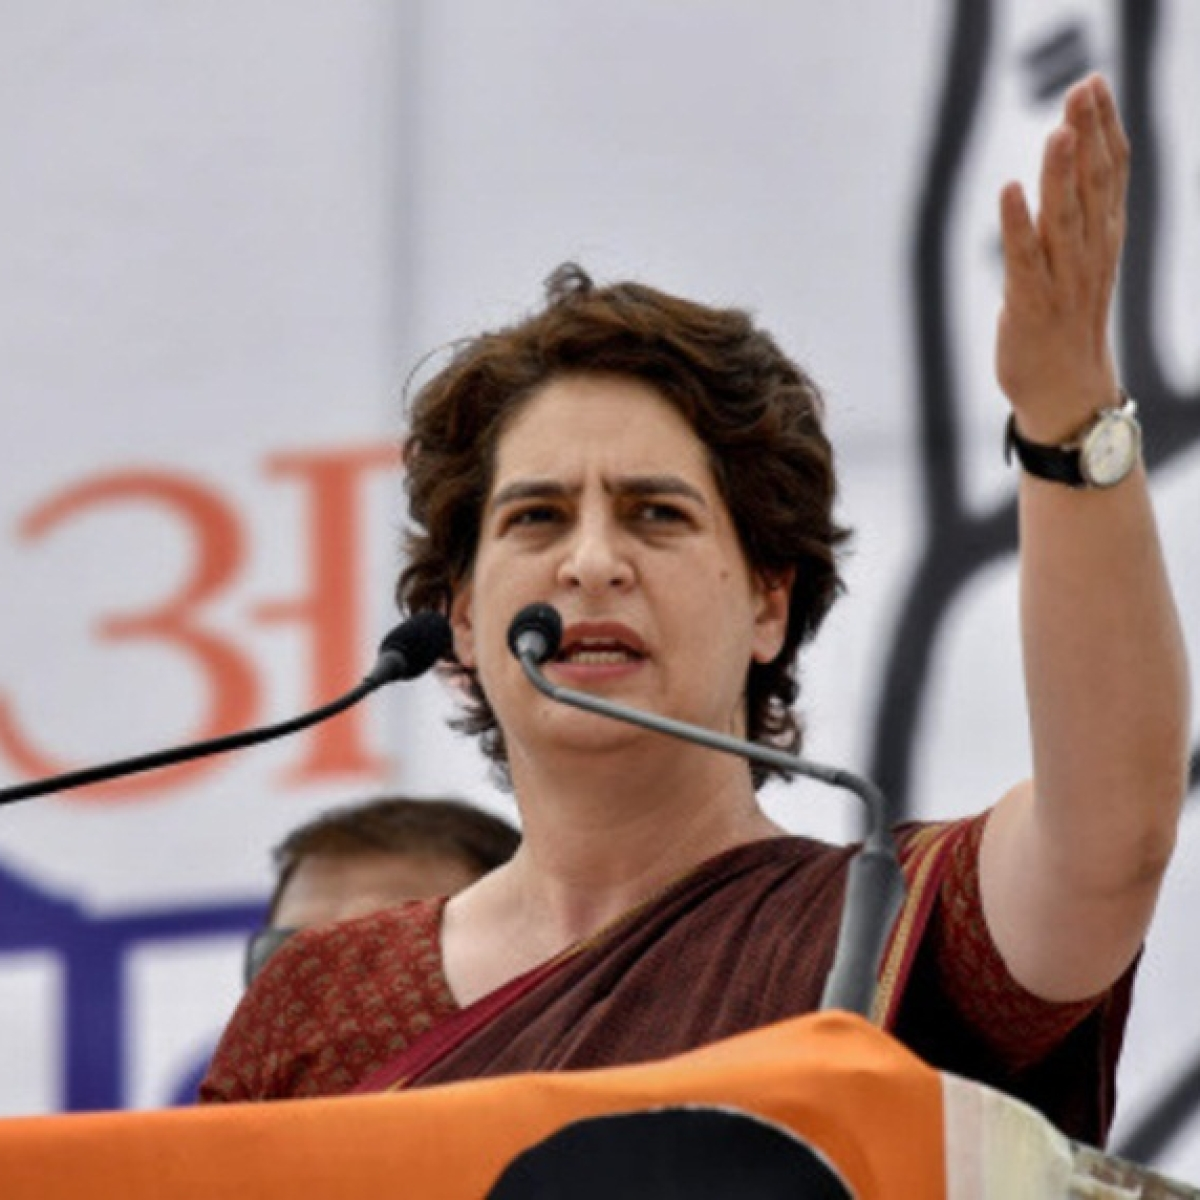 Uttar Pradesh: After farm laws, Priyanka Gandhi targets BJP over new NGT rules